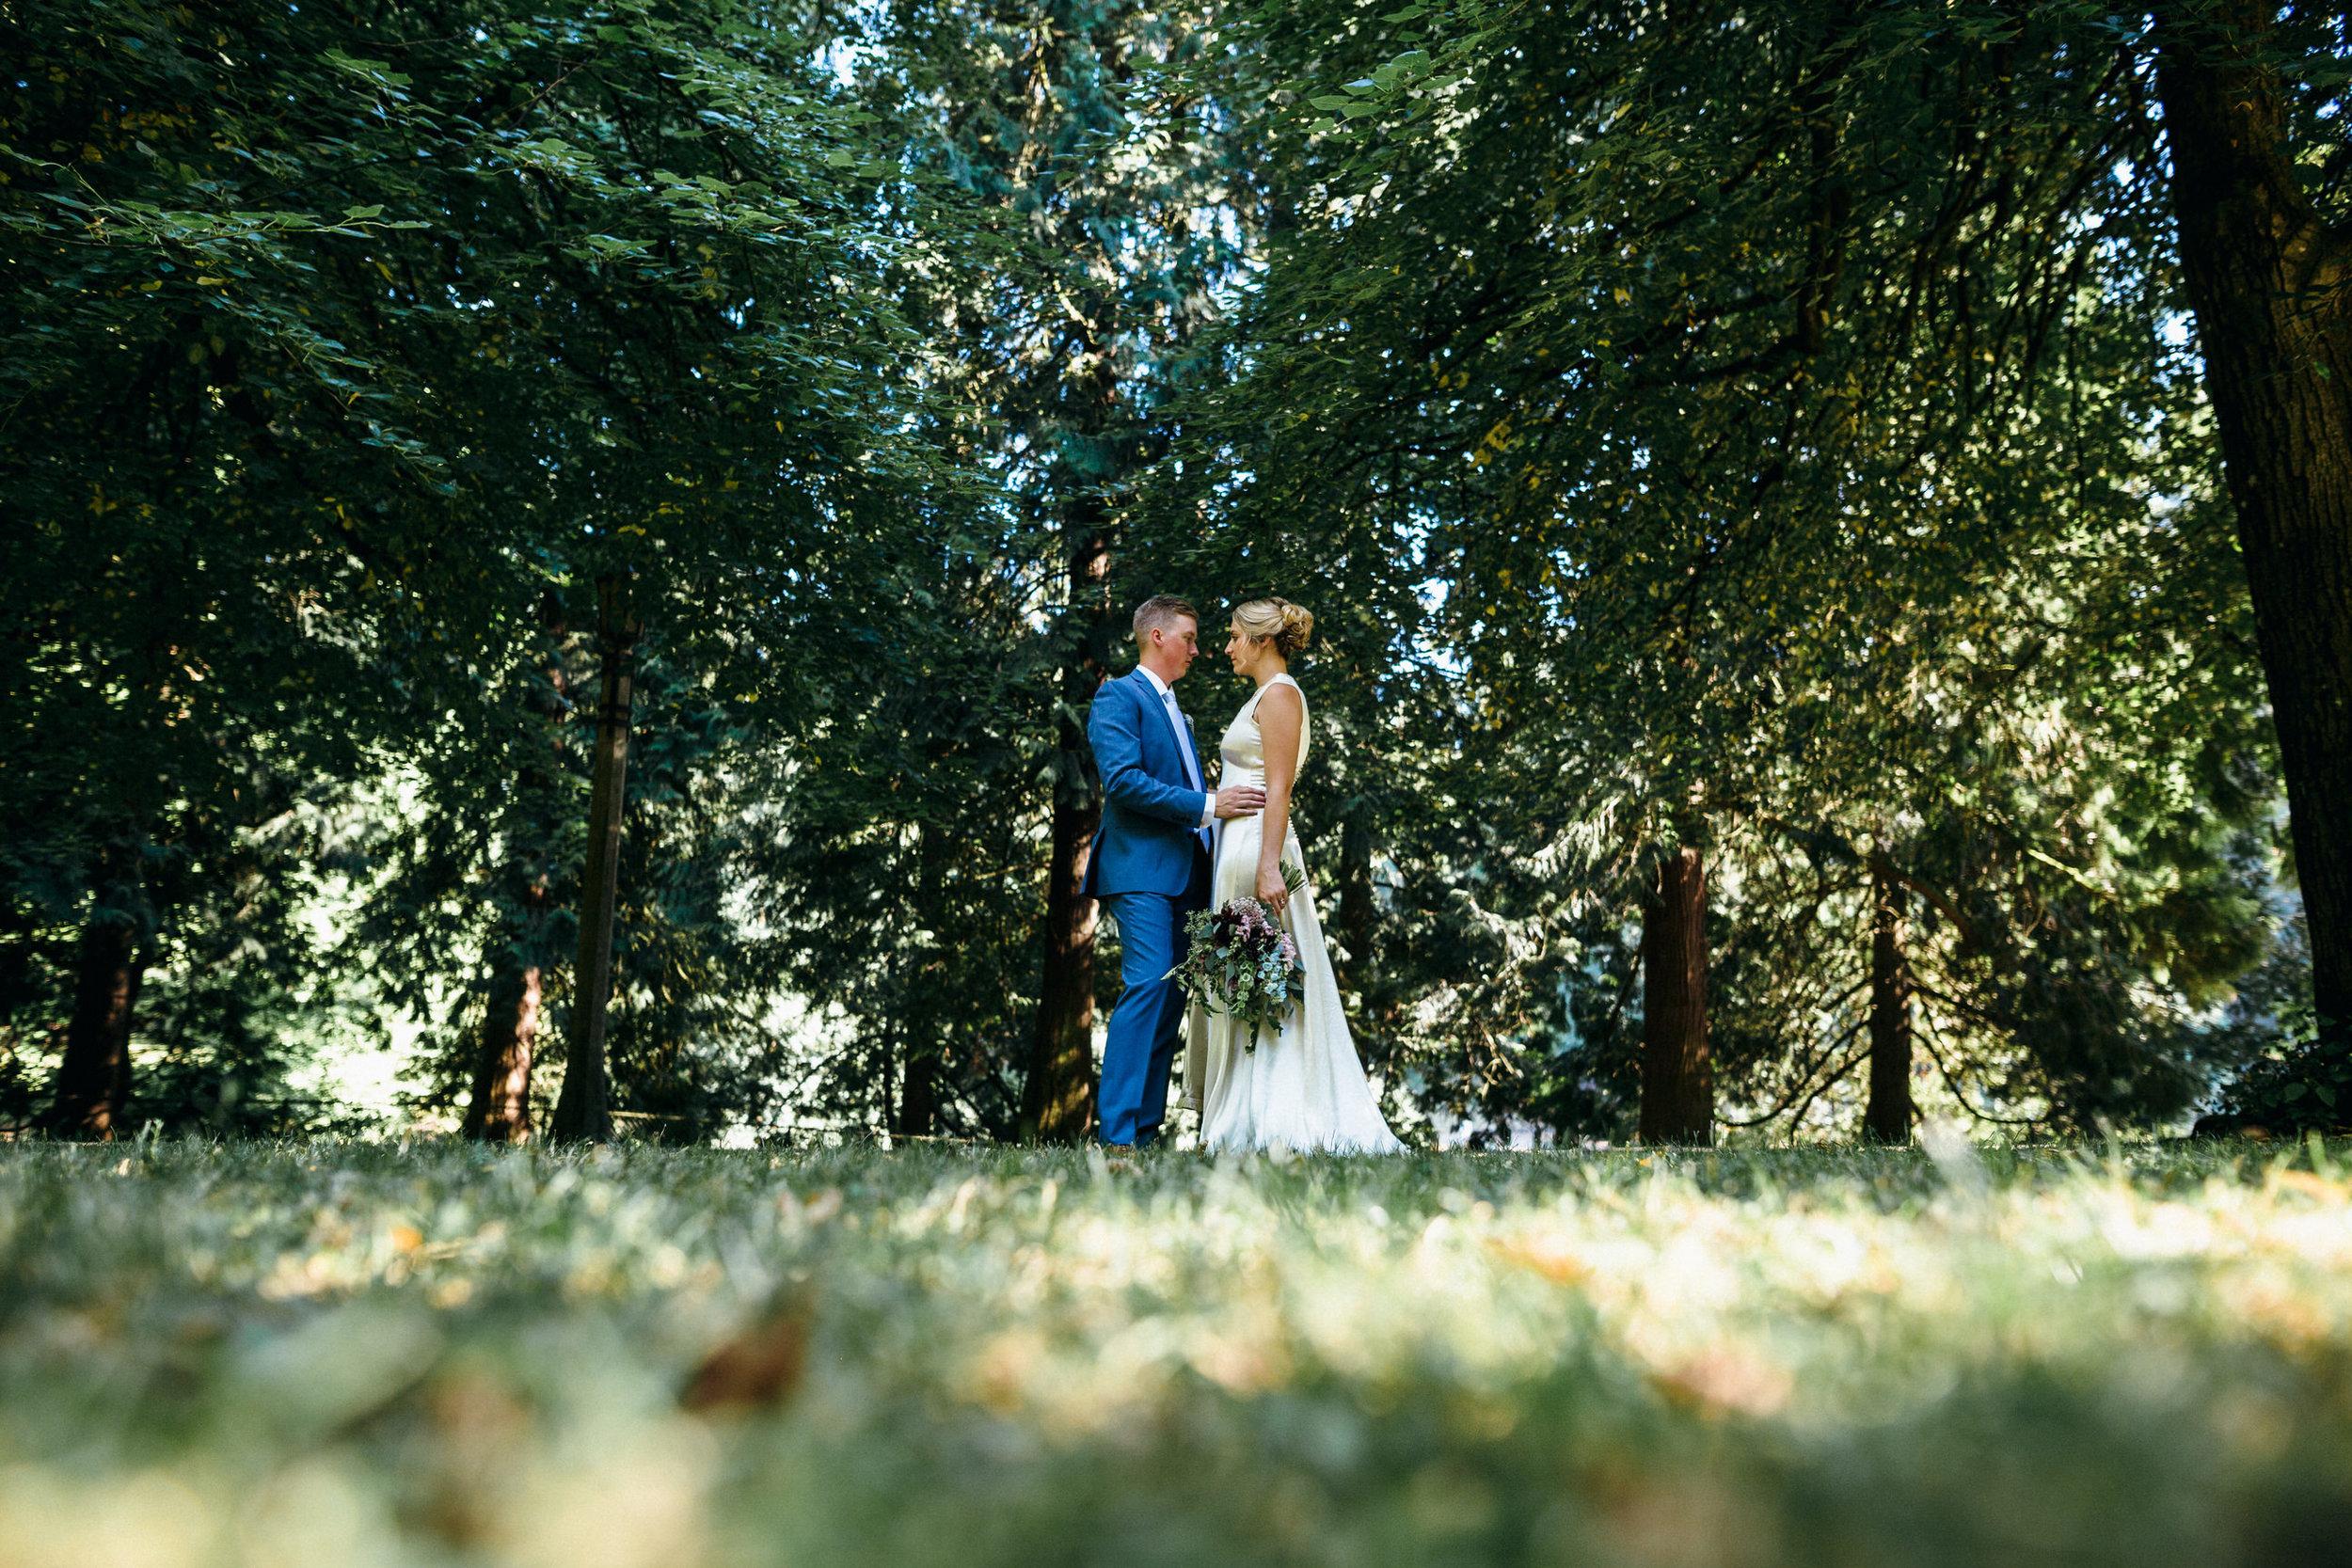 Laurelhurst Park club wedding photographer Portand pdx Oregon070.JPG